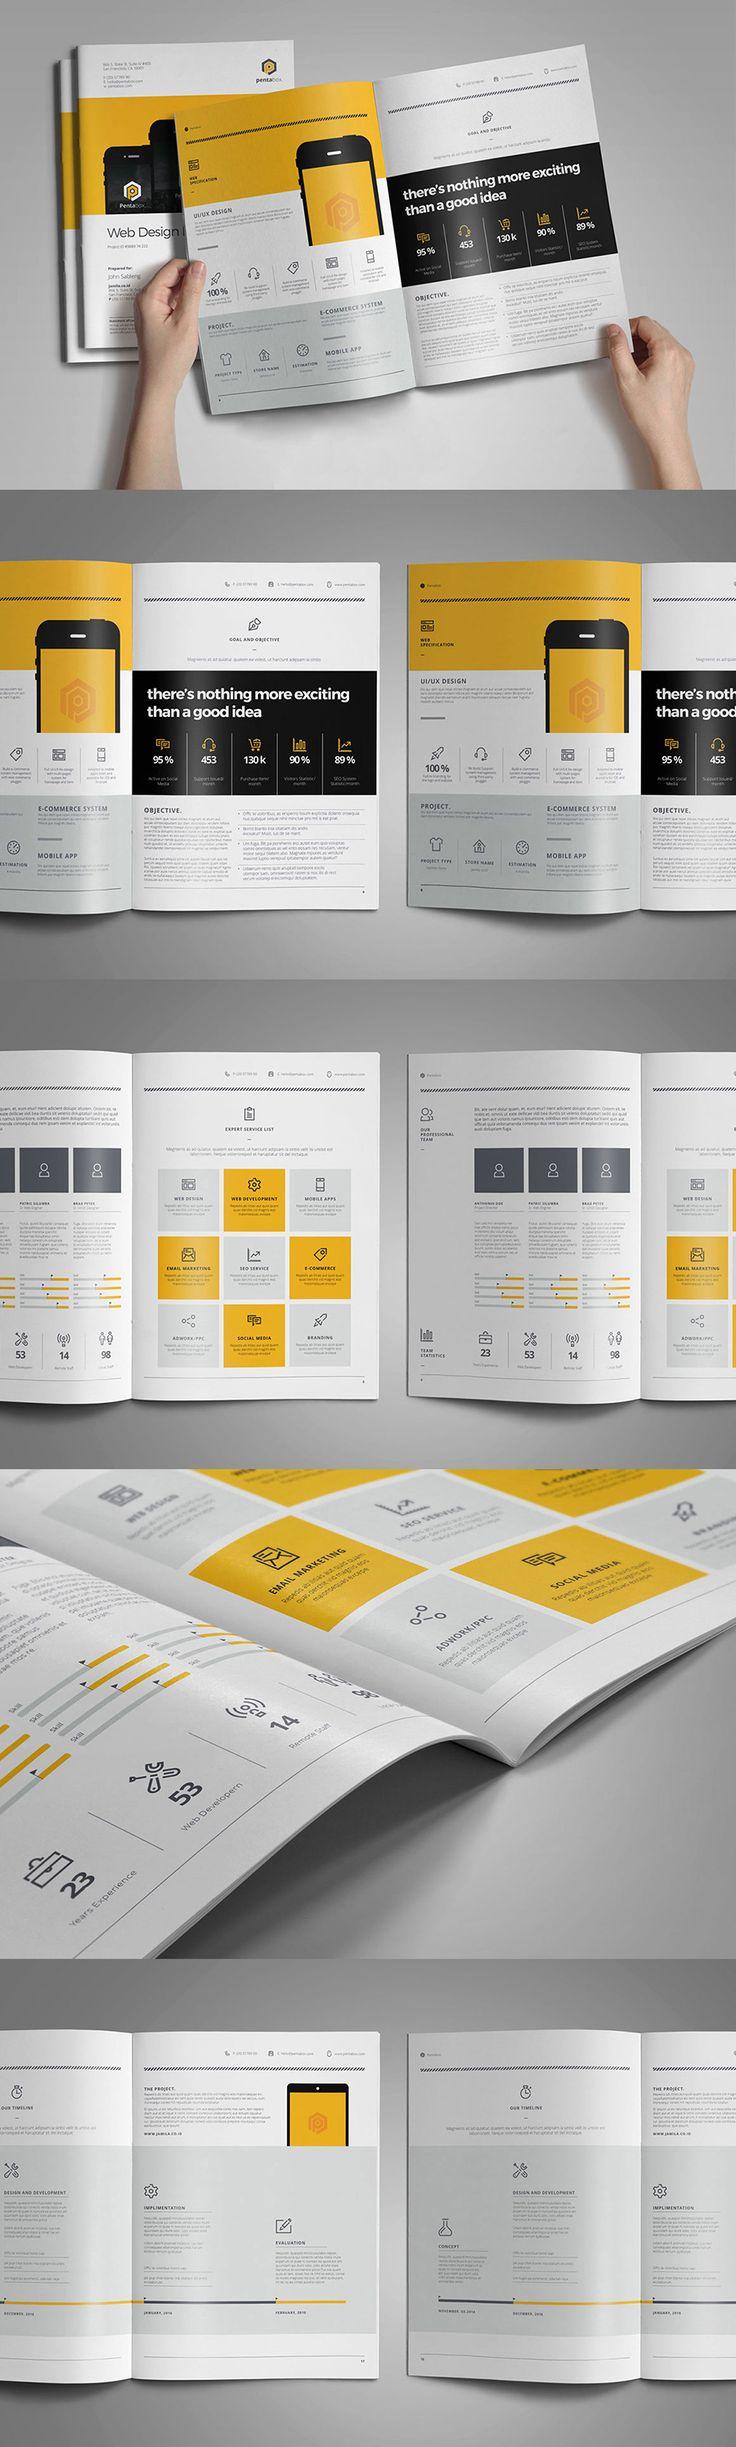 Mejores 111 imágenes de Free Brochure Templates en Pinterest ...